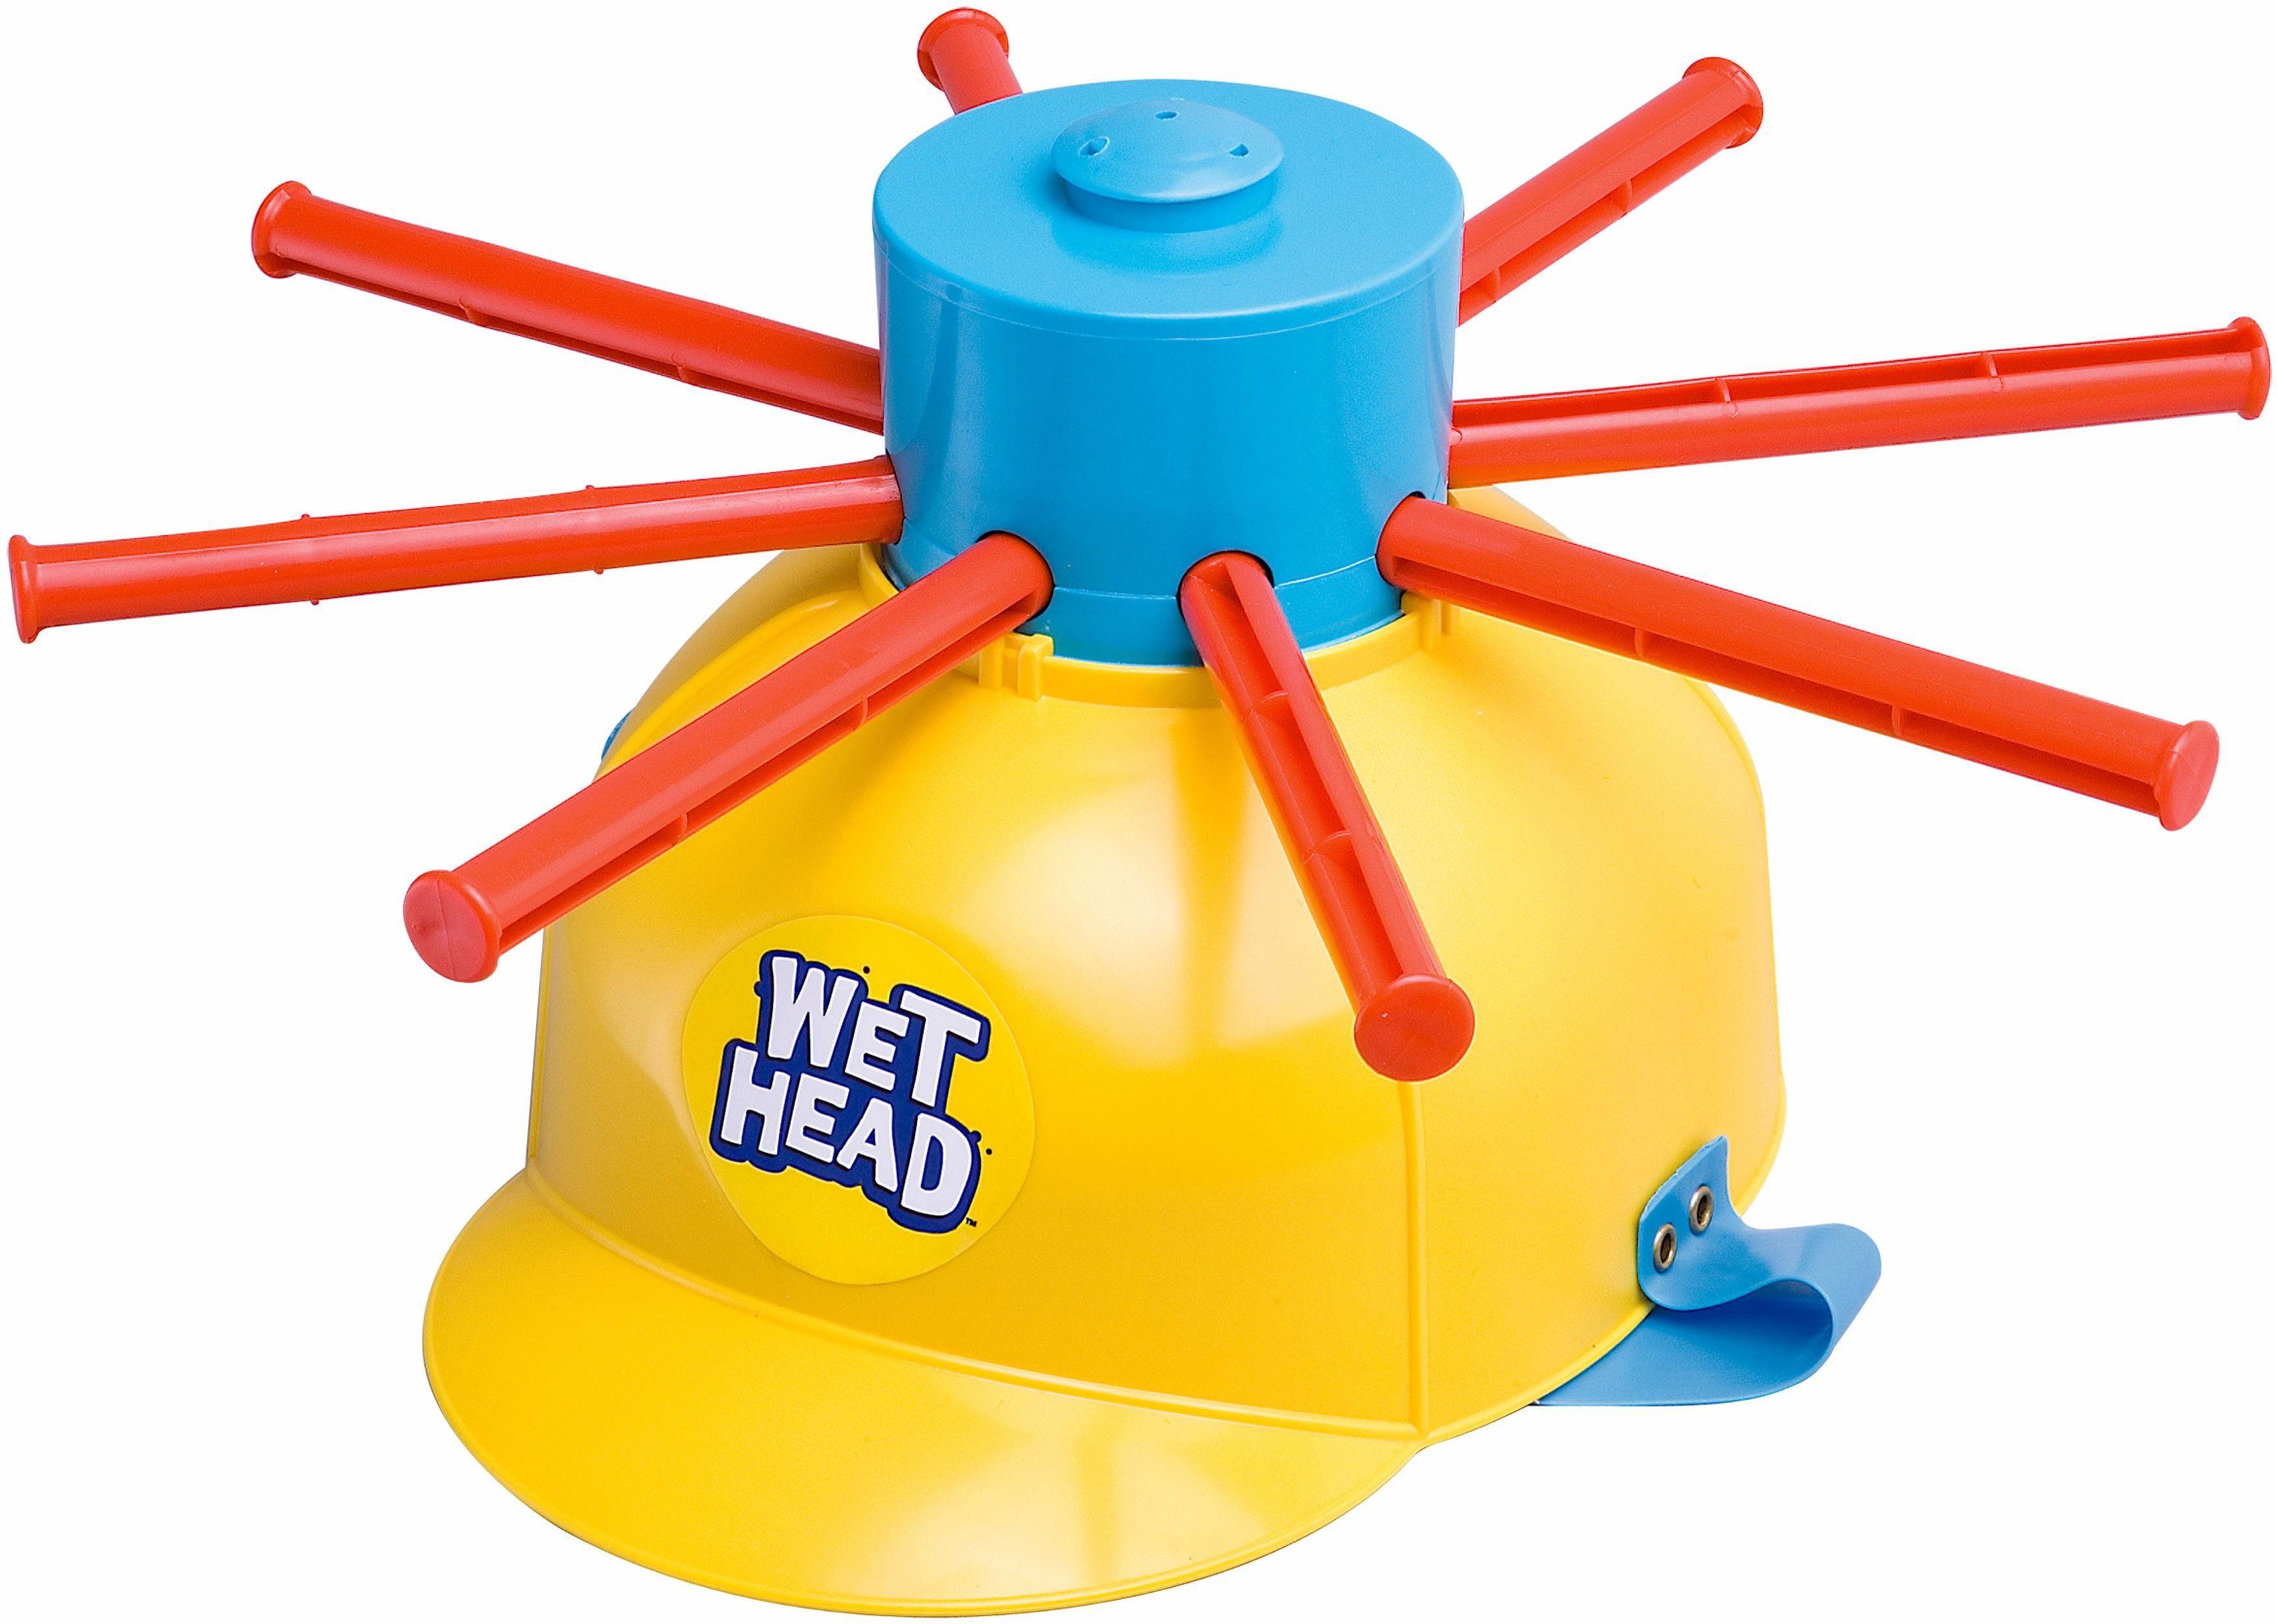 Beluga Outdoorspielzeug, »Wet Head Wasserroulette«